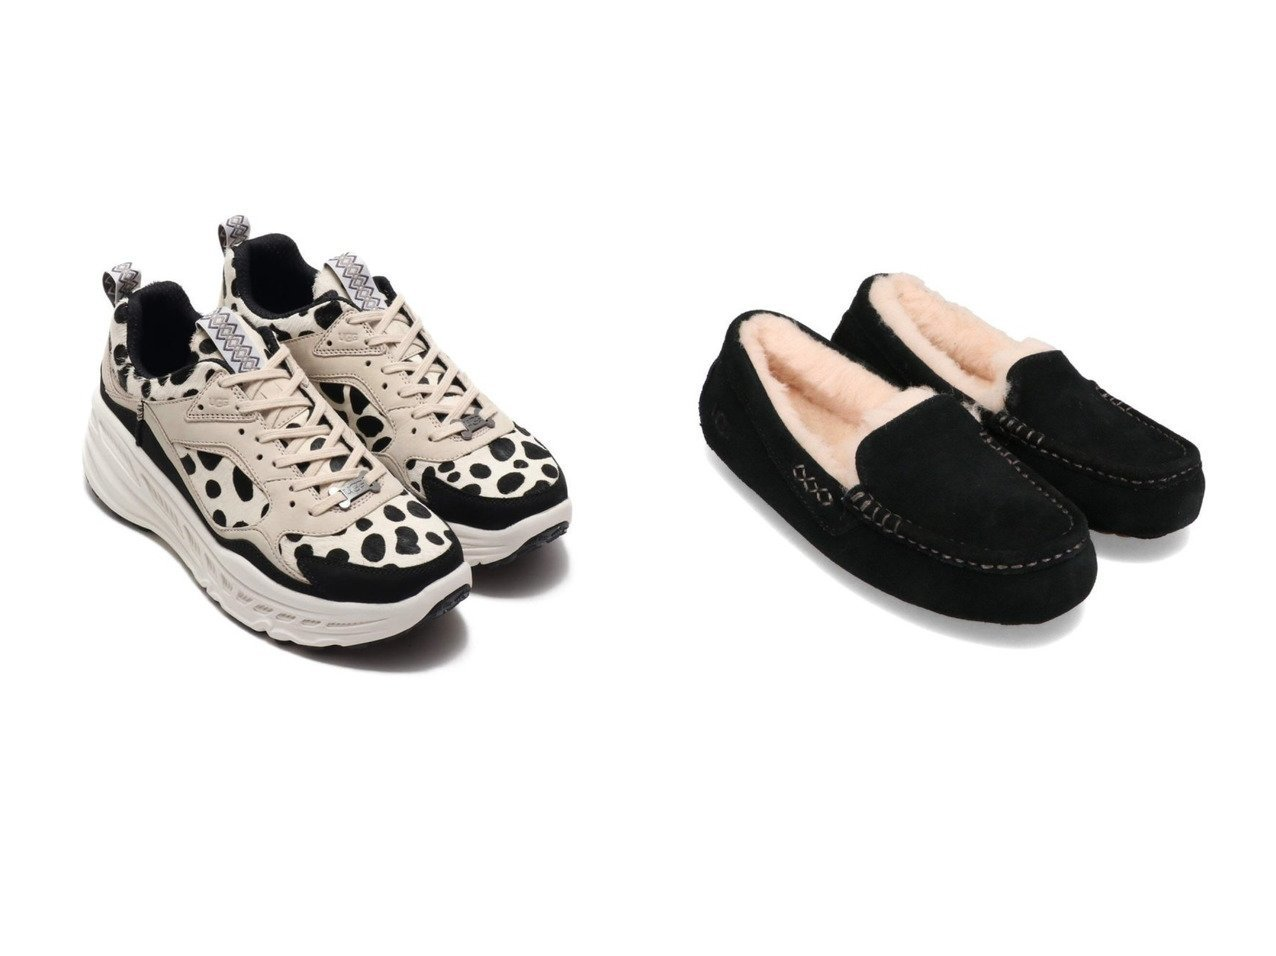 【UGG Australia/アグ】のUGG CA805 Dalmatian&UGG Ansley シューズ・靴のおすすめ!人気、トレンド・レディースファッションの通販 おすすめで人気の流行・トレンド、ファッションの通販商品 メンズファッション・キッズファッション・インテリア・家具・レディースファッション・服の通販 founy(ファニー) https://founy.com/ ファッション Fashion レディースファッション WOMEN シューズ スニーカー スリッポン インソール スエード モダン ライニング 人気 定番 Standard |ID:crp329100000016315